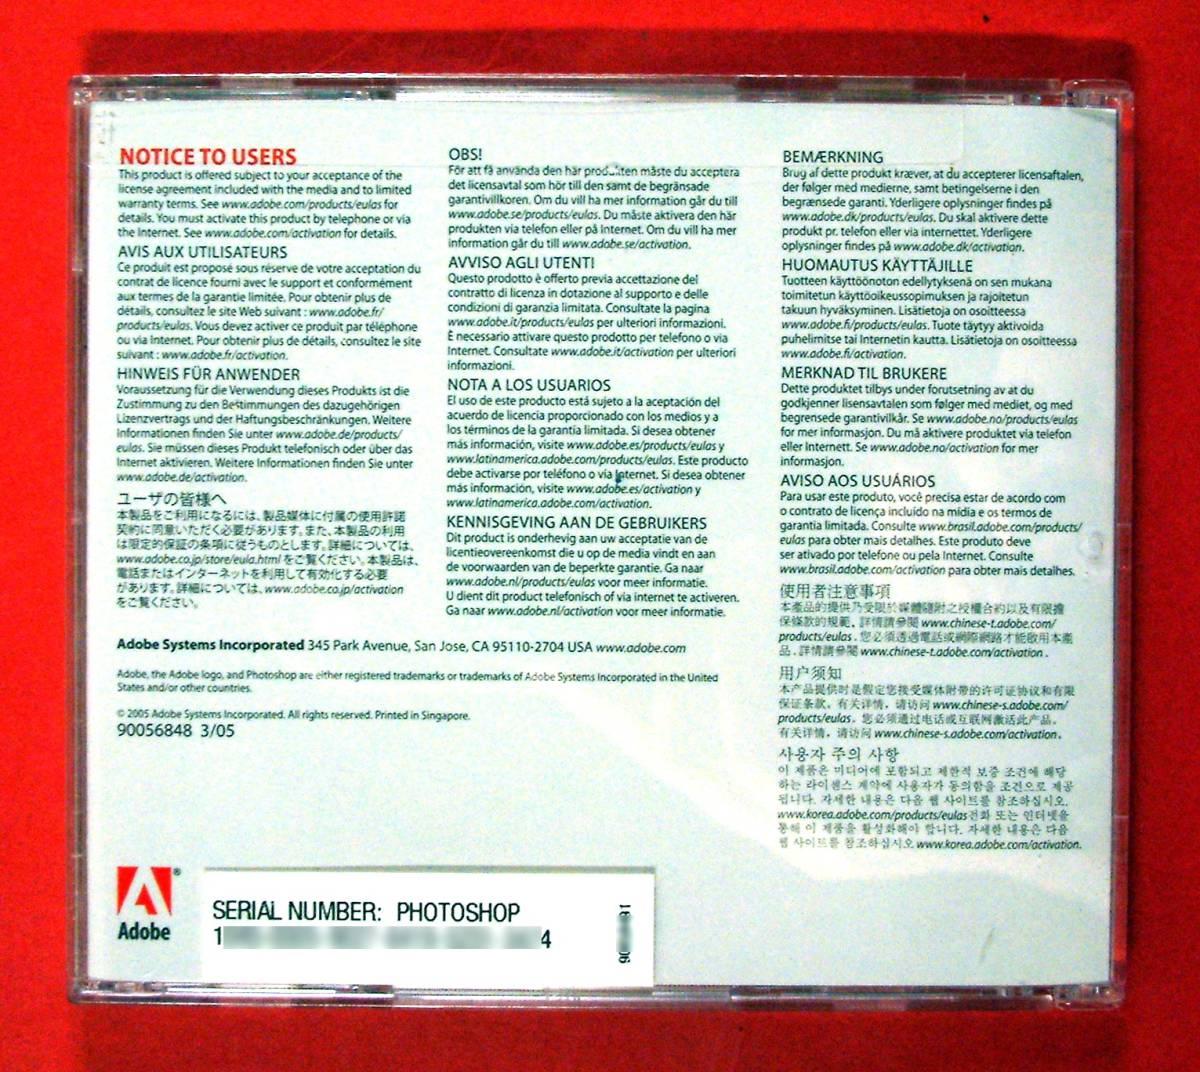 【3498】 5029766719075 Adobe Photoshop CS2 Macintosh メディア未開封品 アドビ フォトショップ (画像 イメージ 写真)(編集 加工)ソフト_画像2